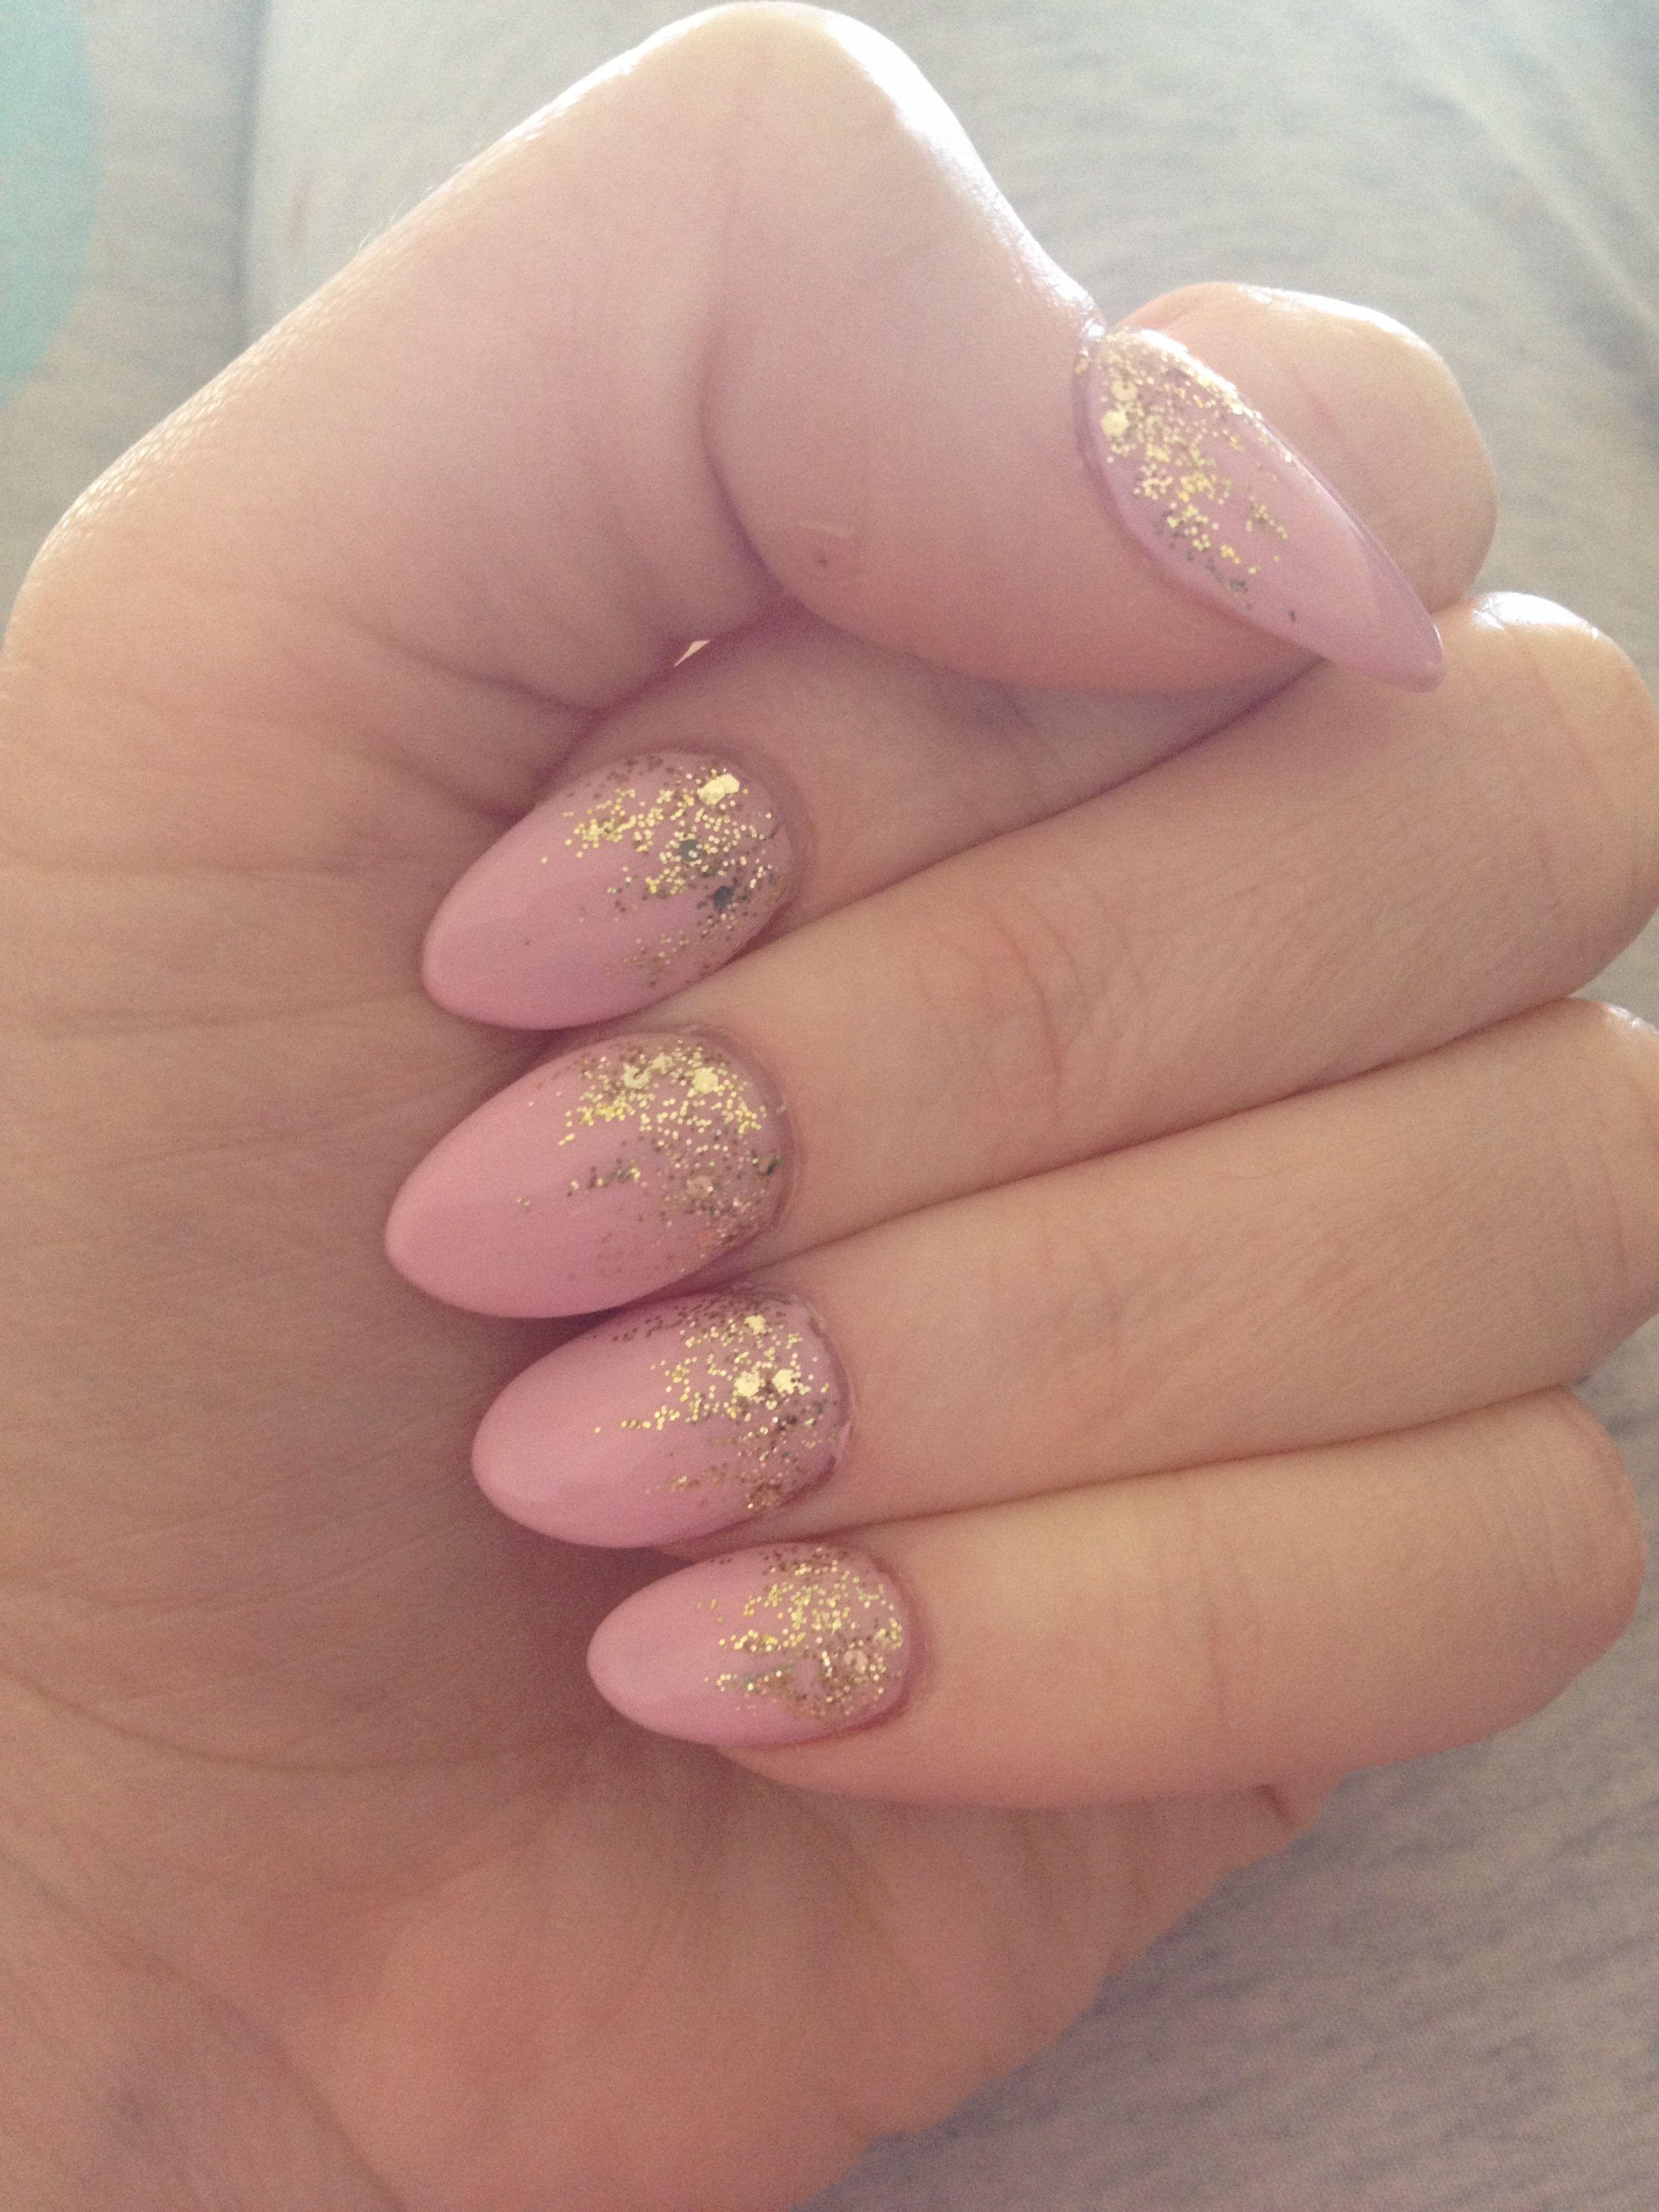 Petal pink and gold spring nails #almondshape #spring